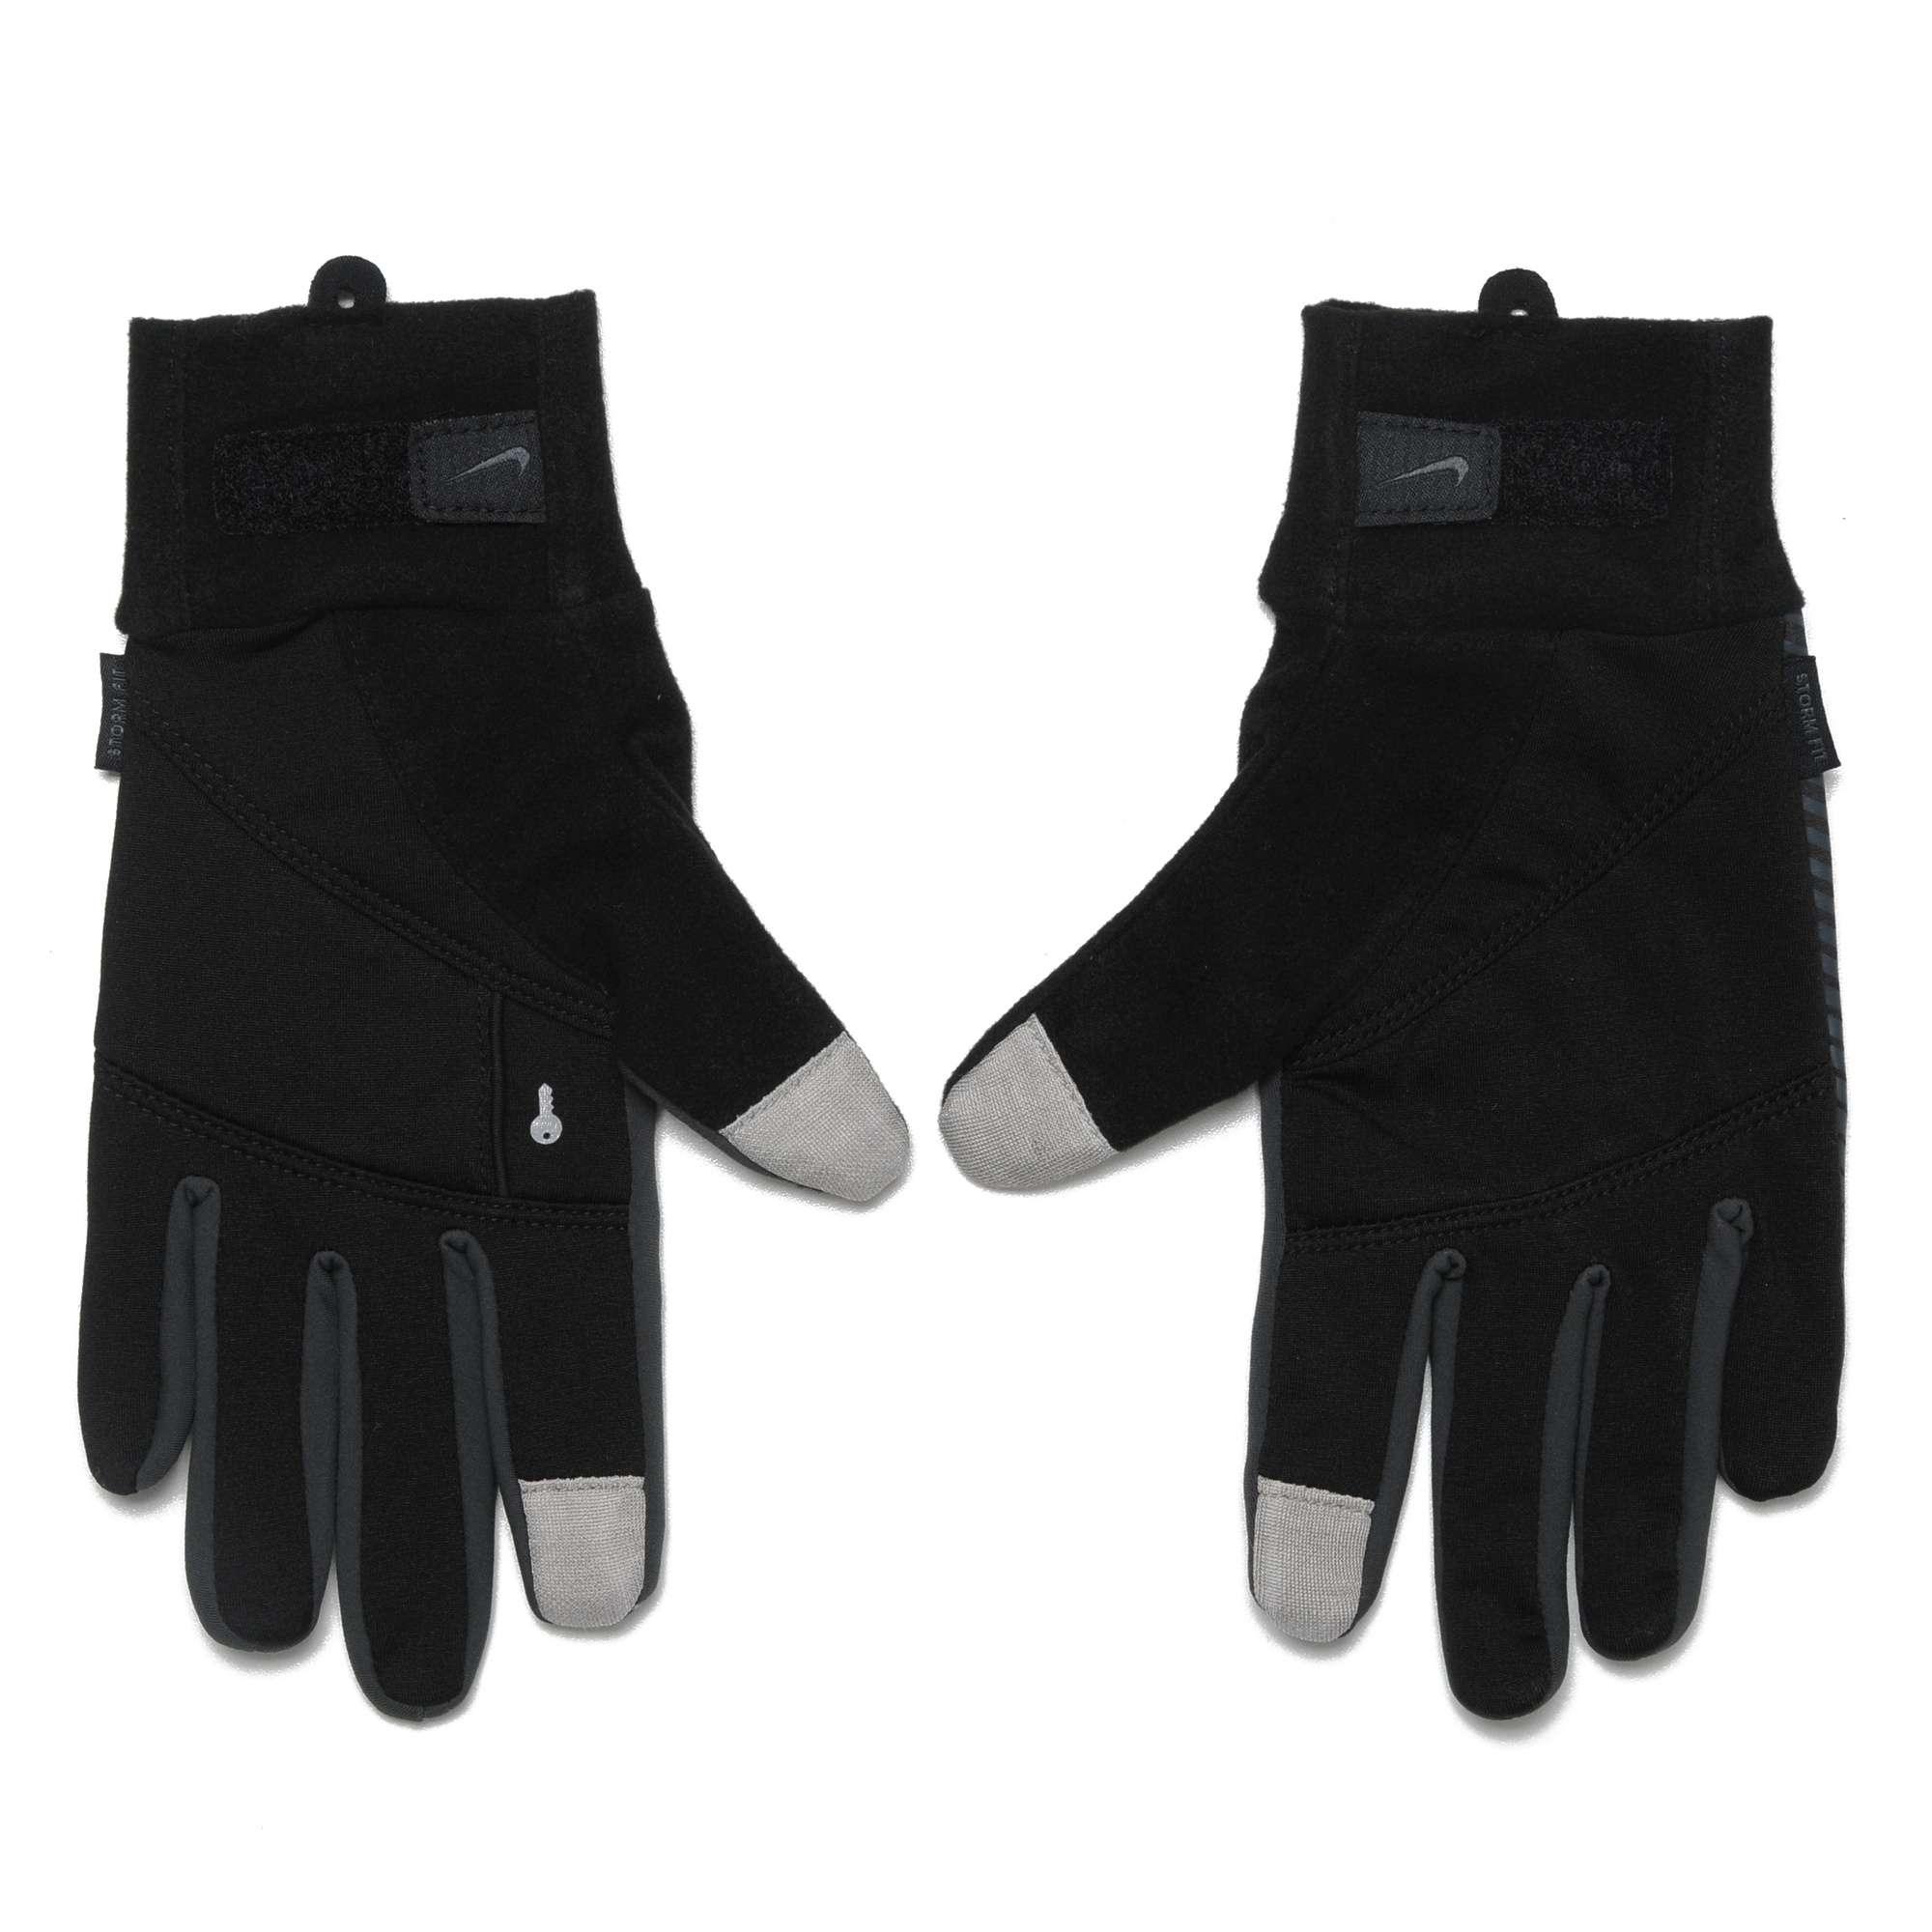 Nike Storm-FIT Elite Running Gloves